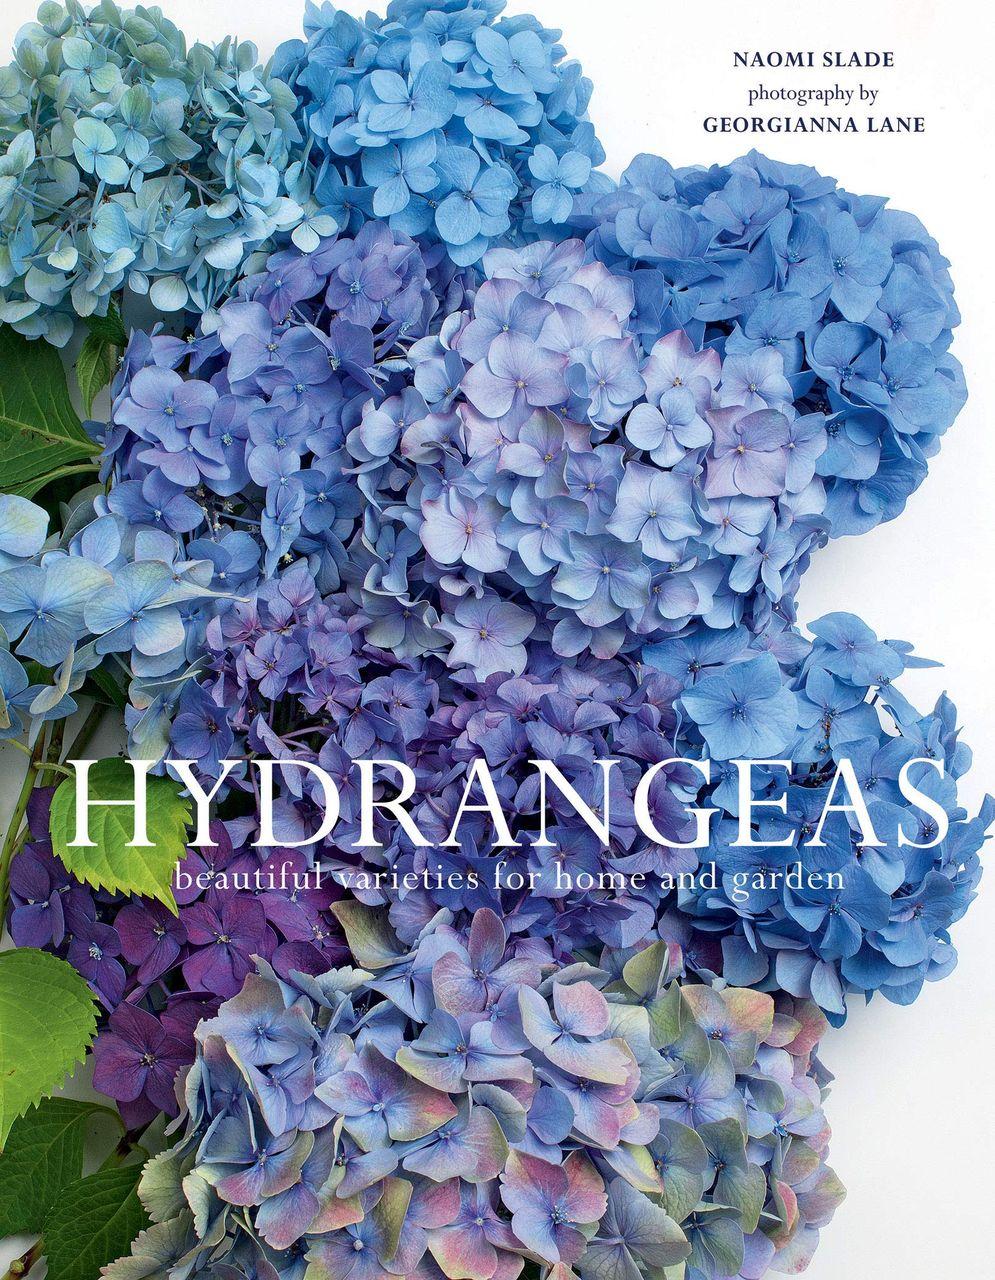 Hydrangeas by Naomi Slade